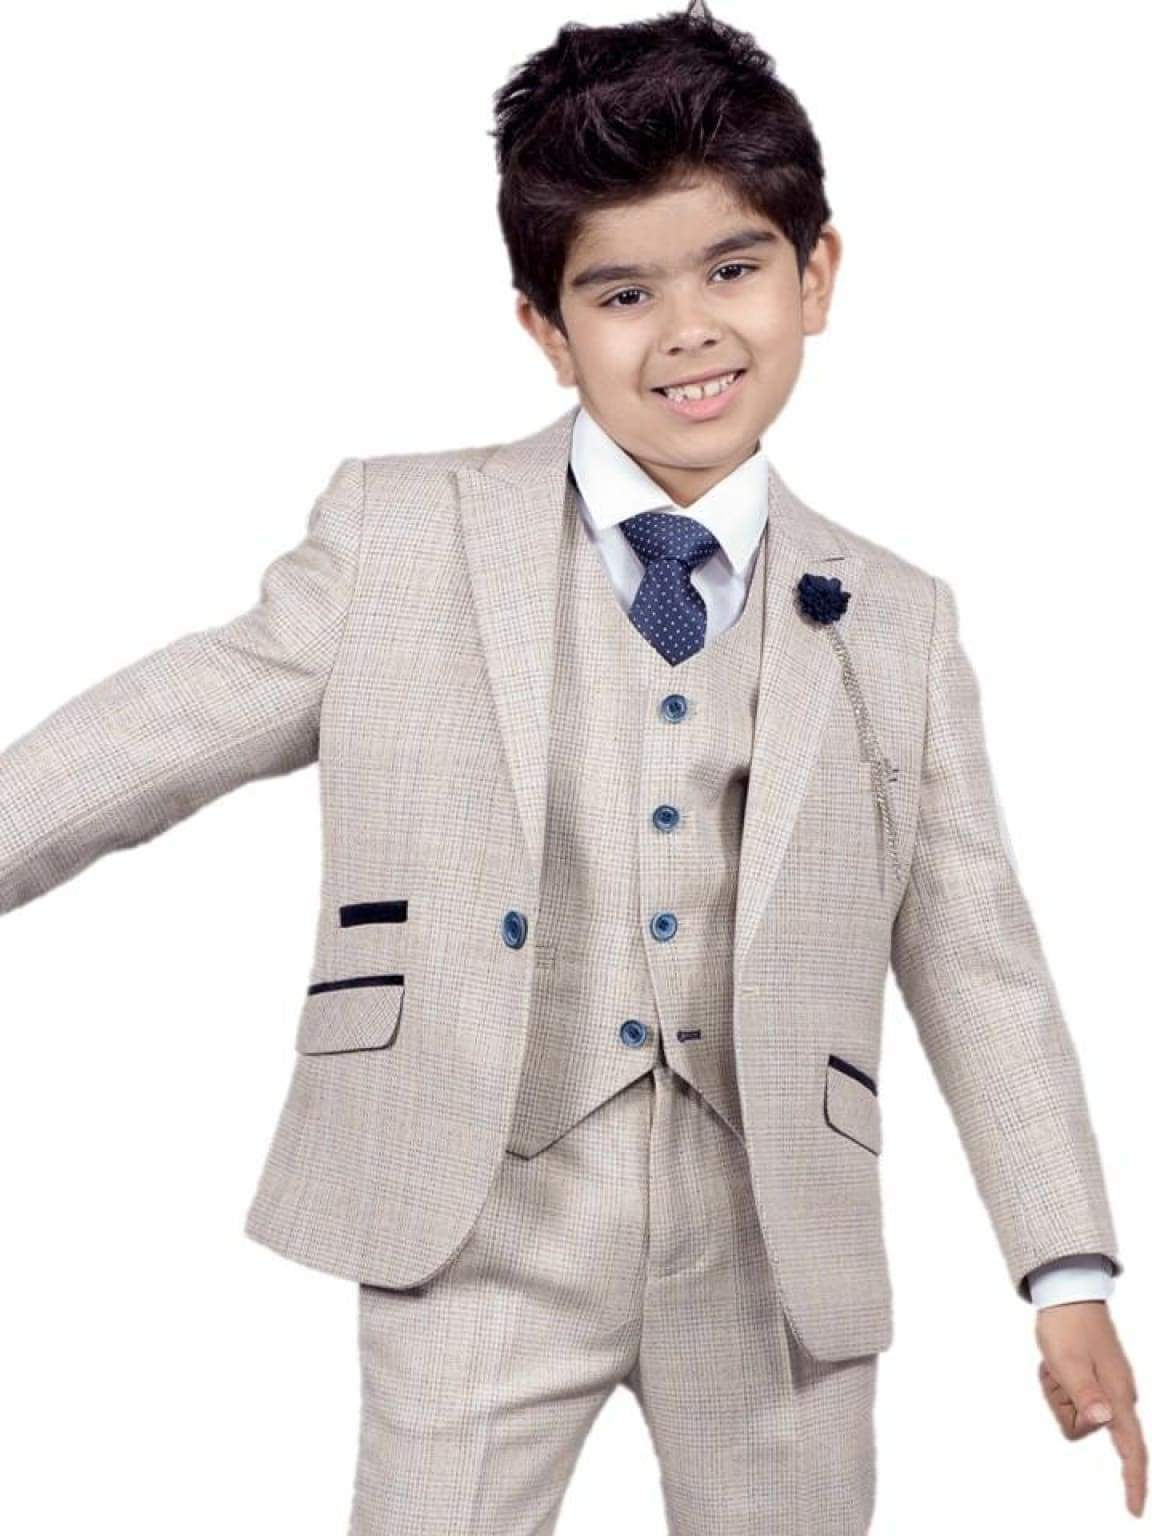 Cavani Caridi Boys Cream Three Piece Slim Fit Check Wedding Suit - 1 YEAR - Suit & Tailoring